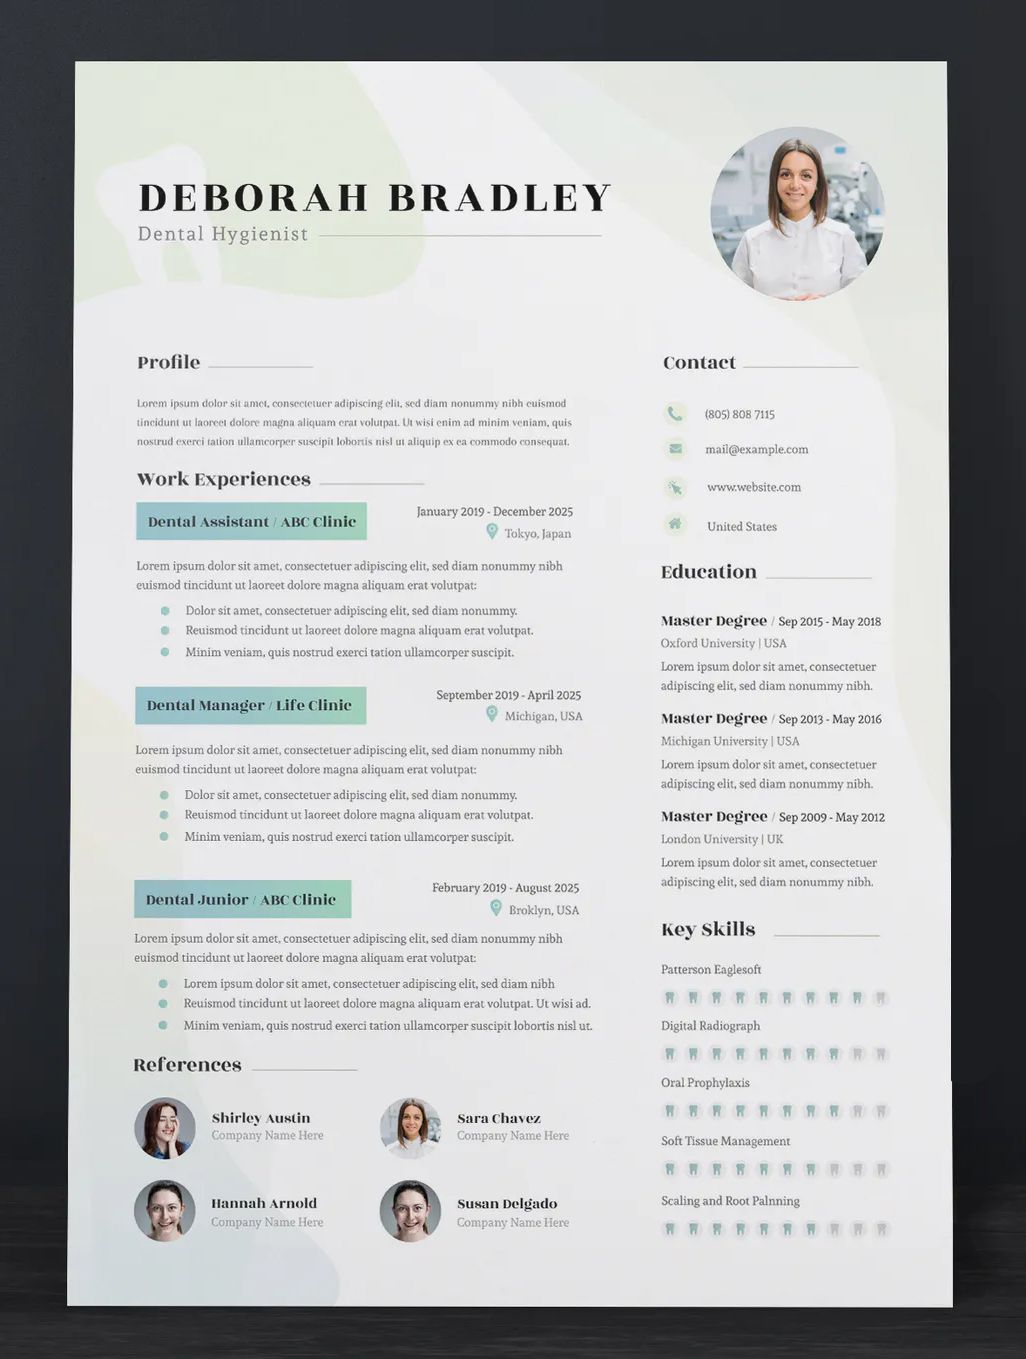 Dental resume cv template ai eps pdf in 2020 cv